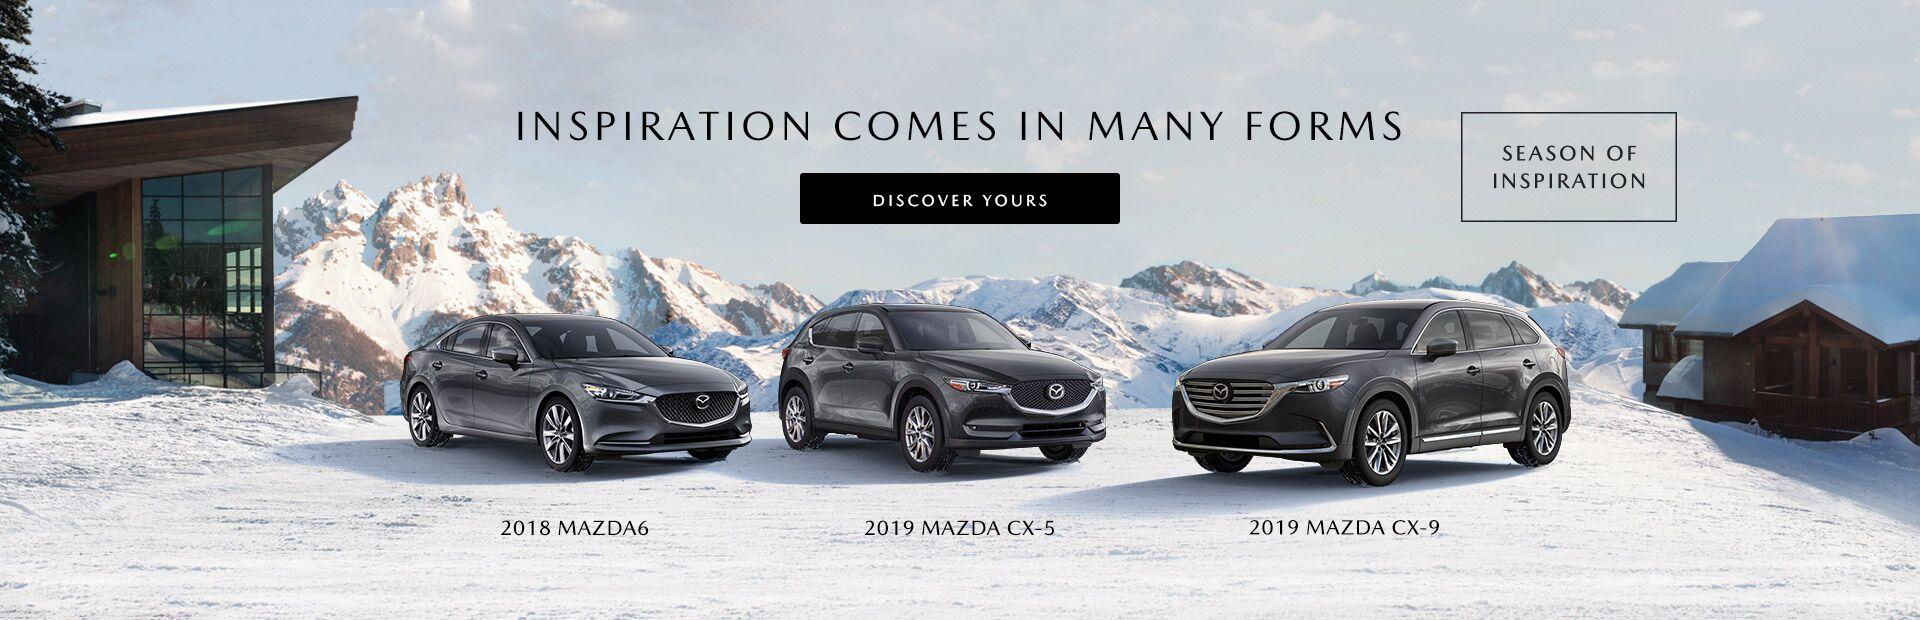 hight resolution of season of inspiration 2018 mazda3 5 door